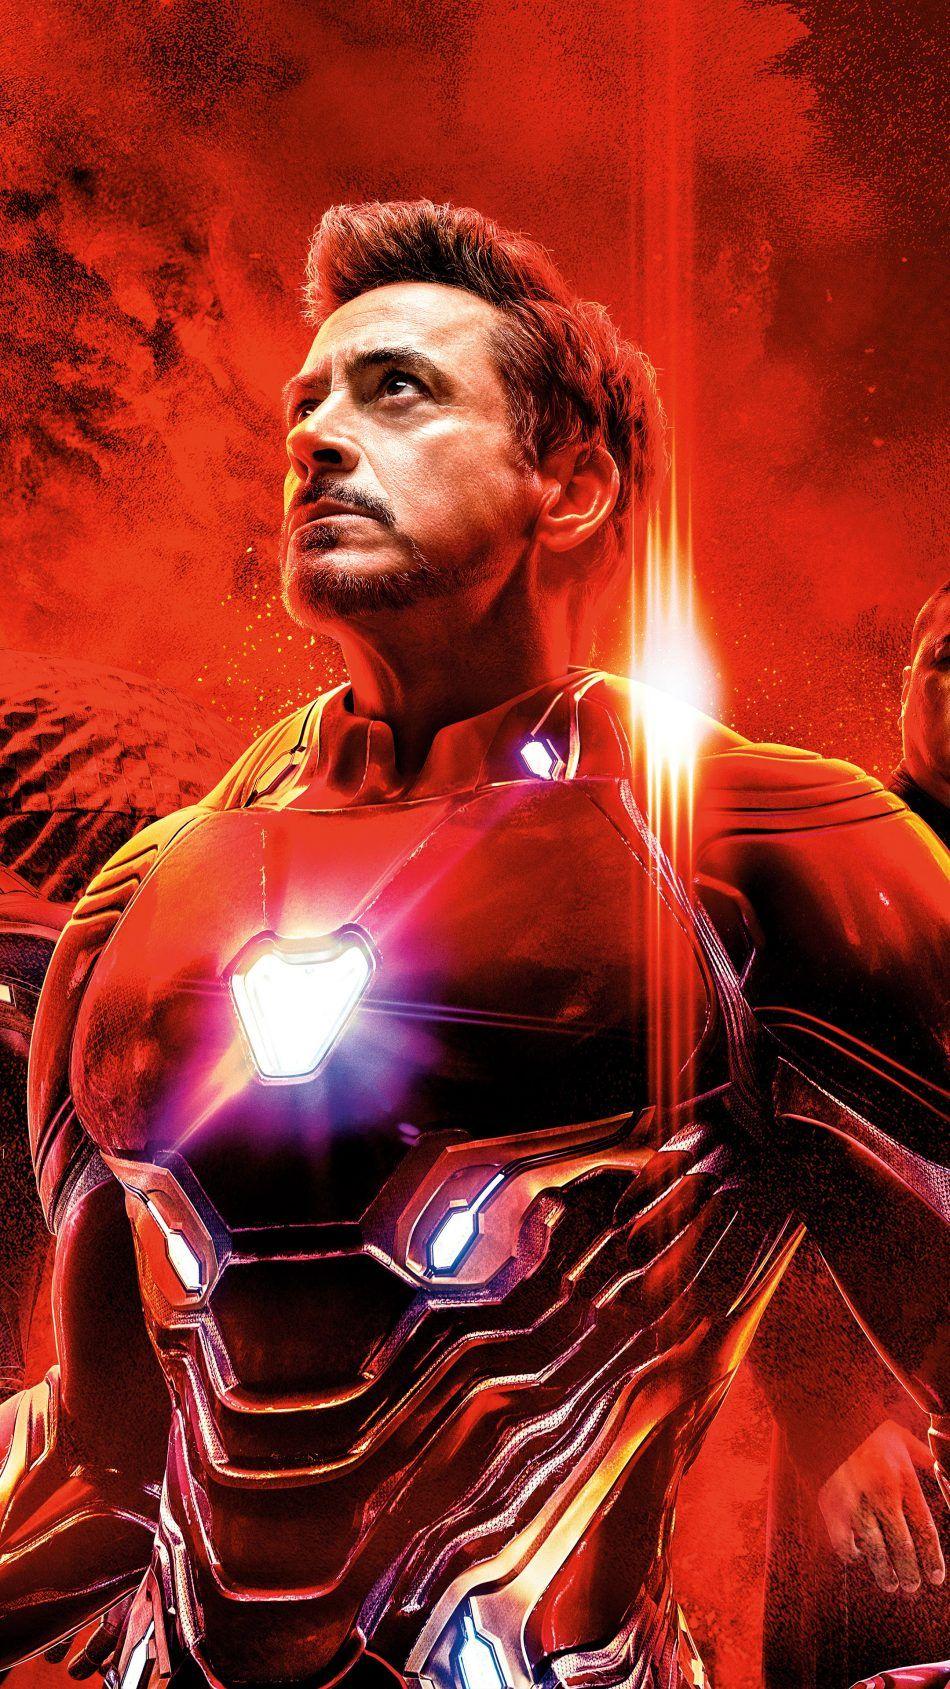 Mcu Tony Stark Iron Man Iron Man Poster Iron Man Avengers Iron Man Wallpaper